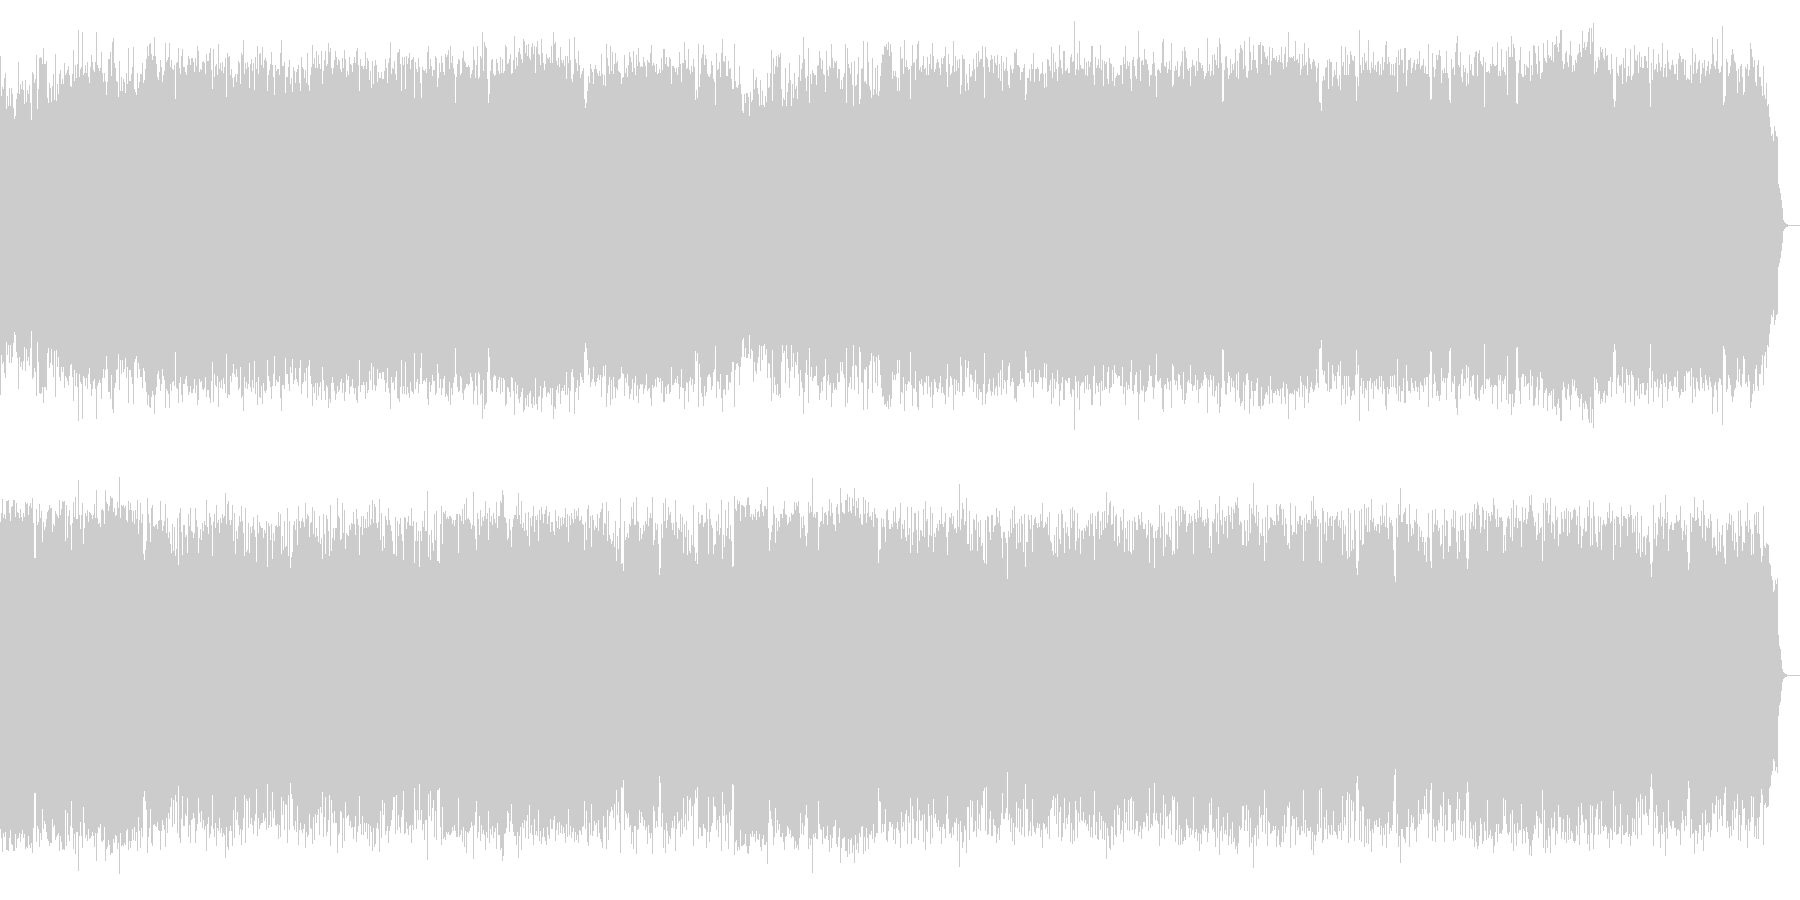 SAXほっこりする温かい曲風の未再生の波形